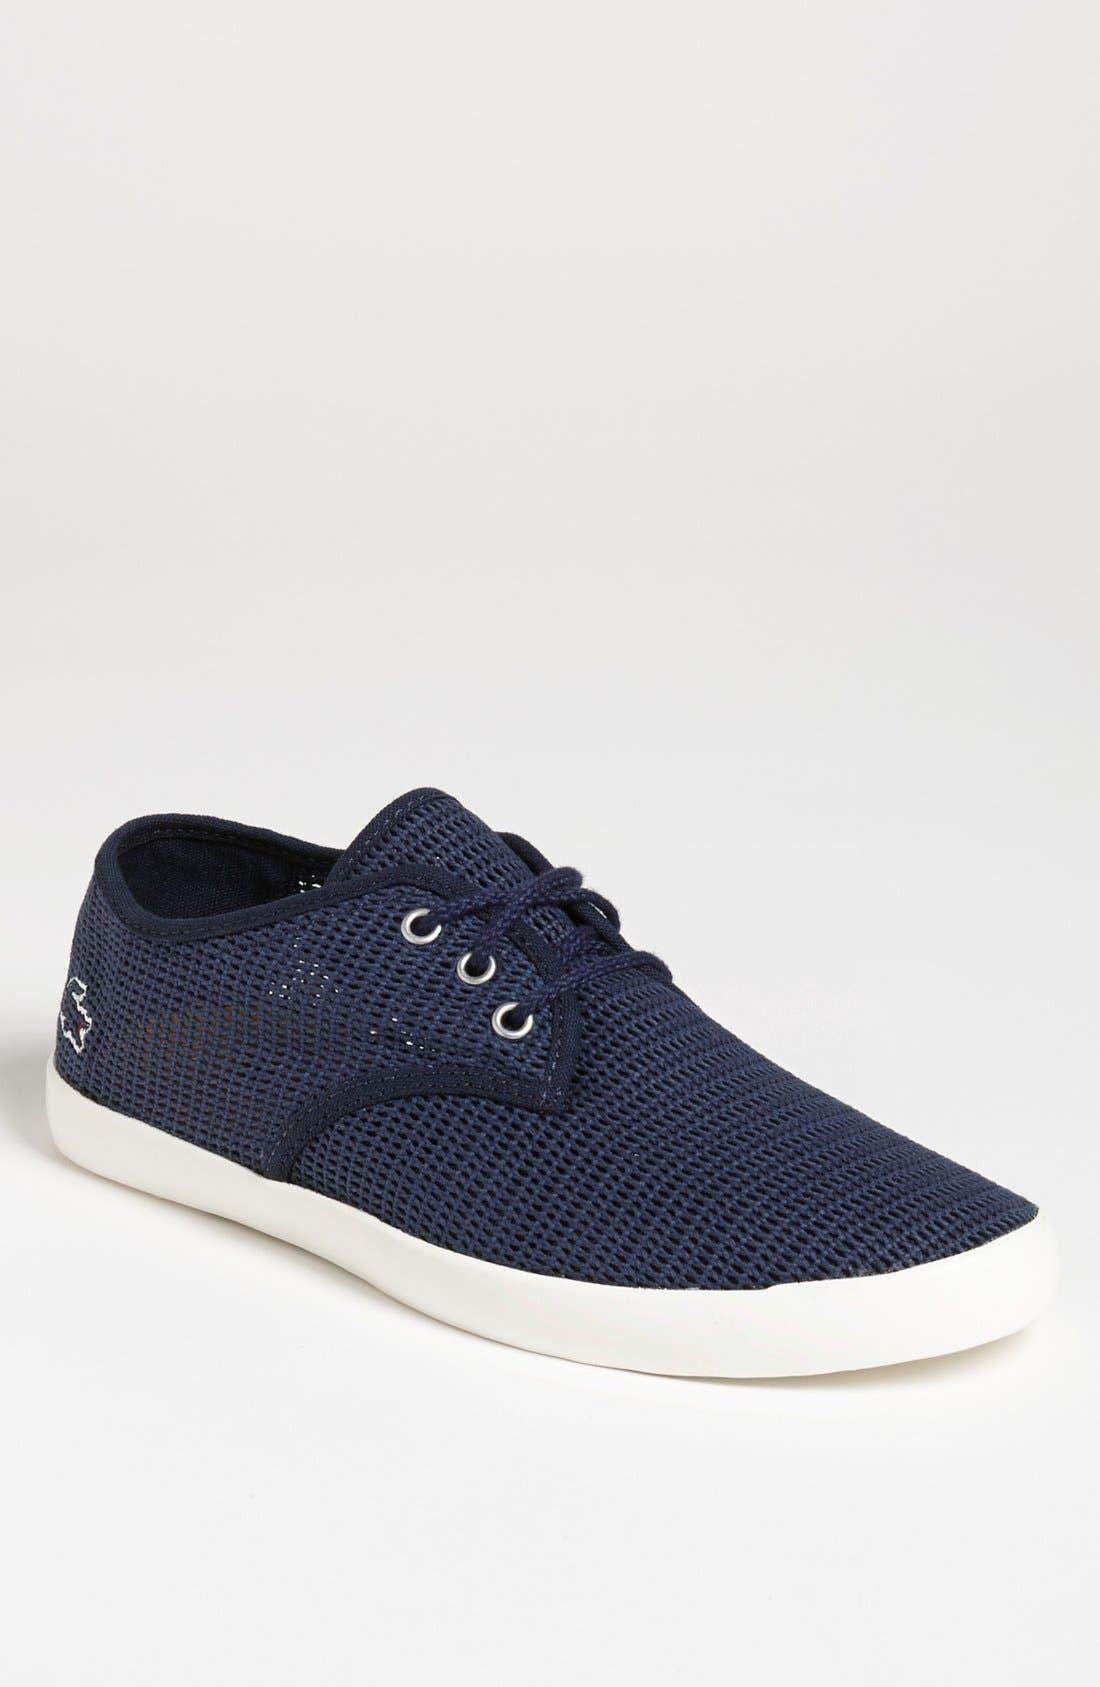 Main Image - Lacoste 'Aristide 10' Sneaker (Men)